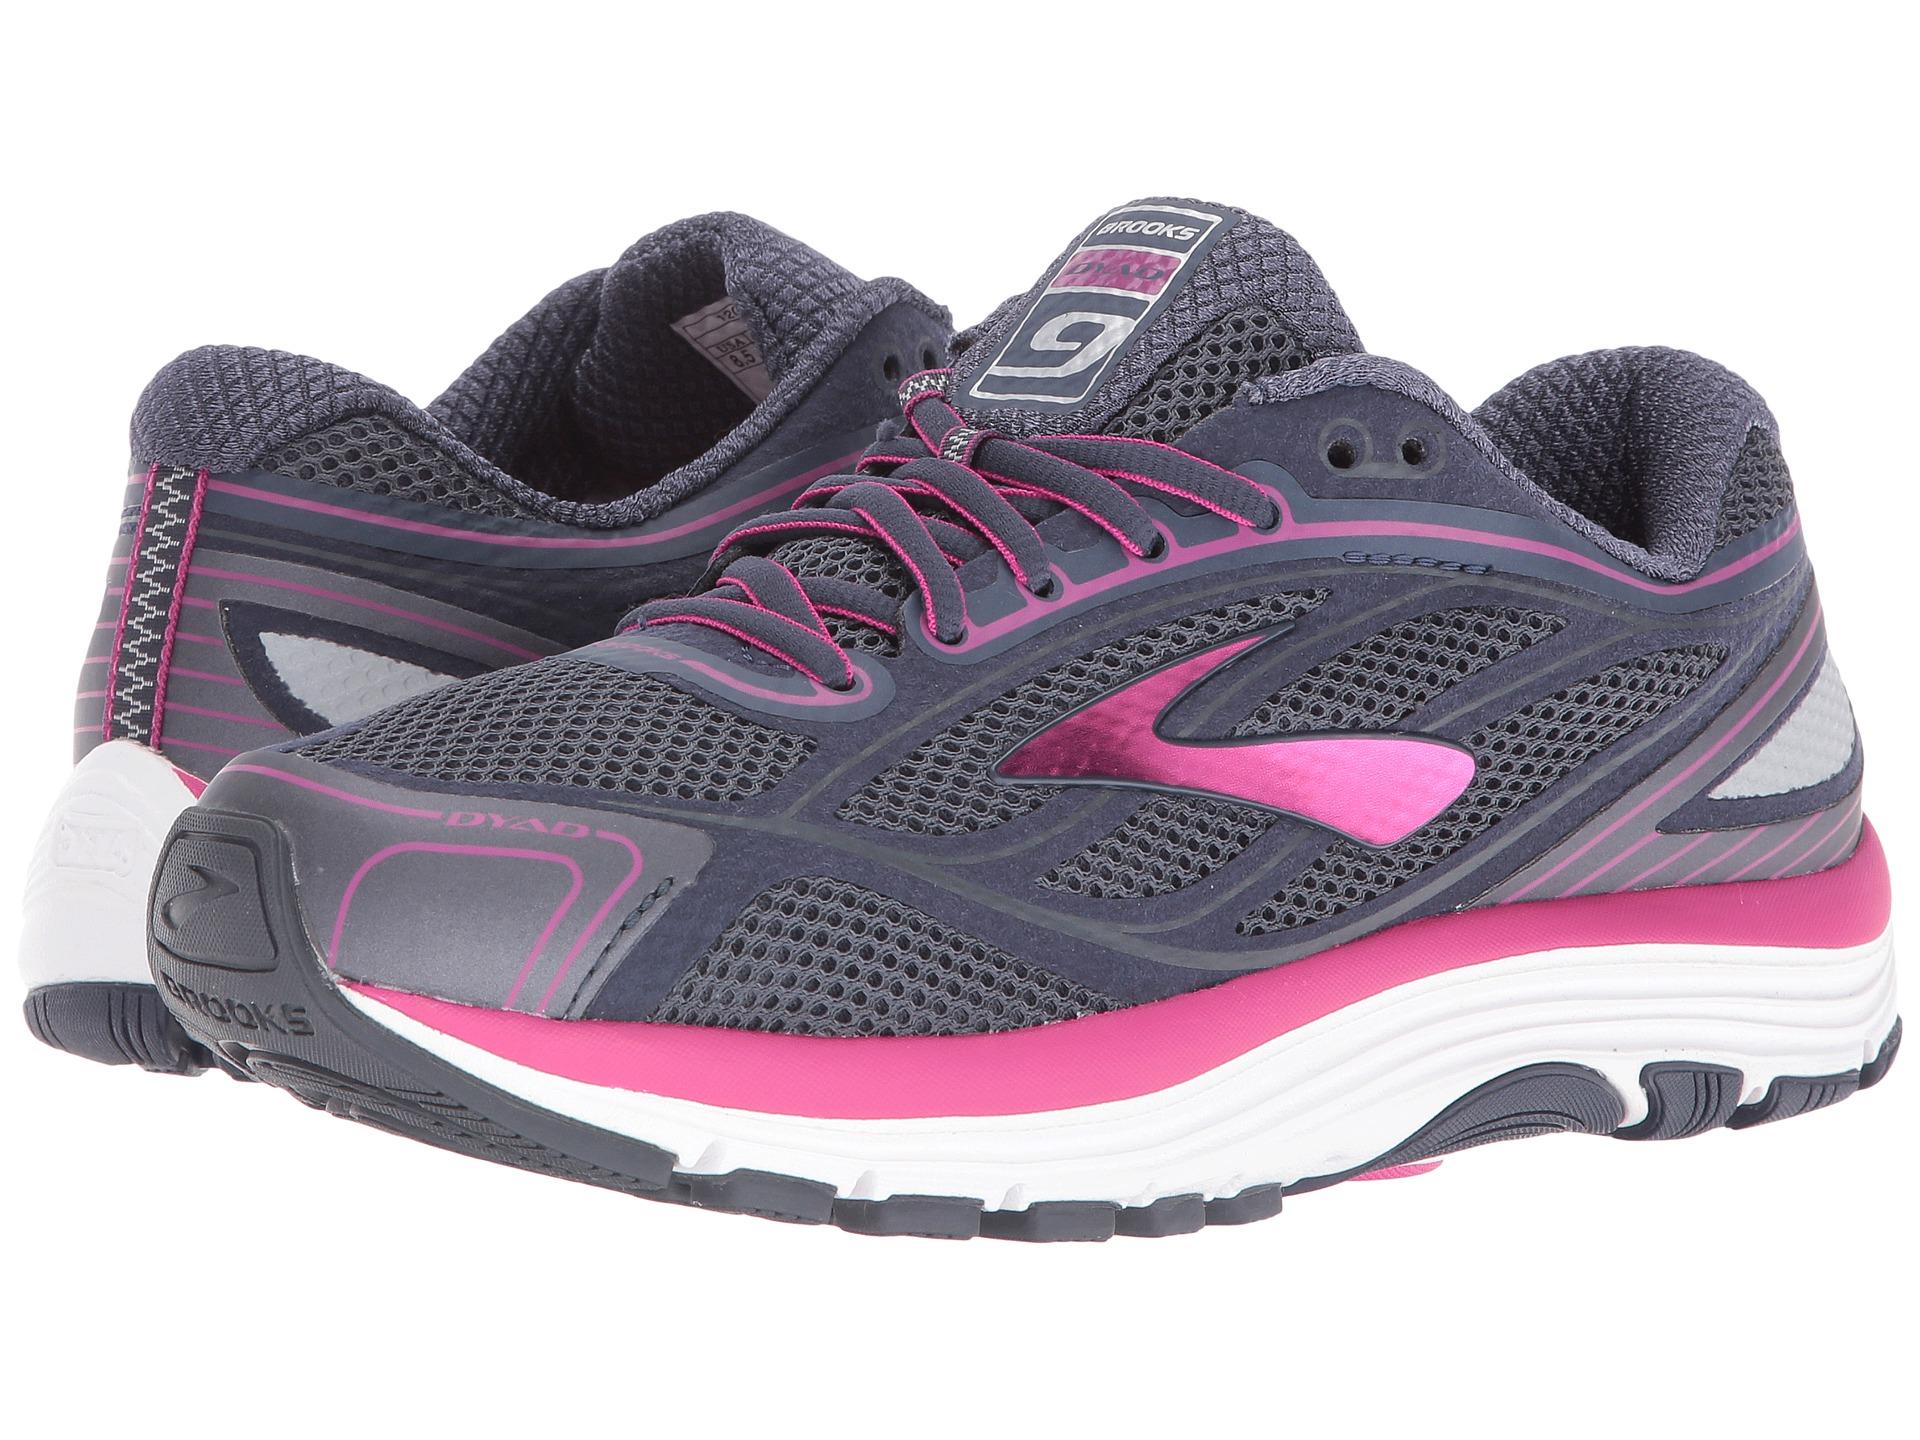 brooks shoes womens purple for sale   OFF36% Discounts a3b665ada3a